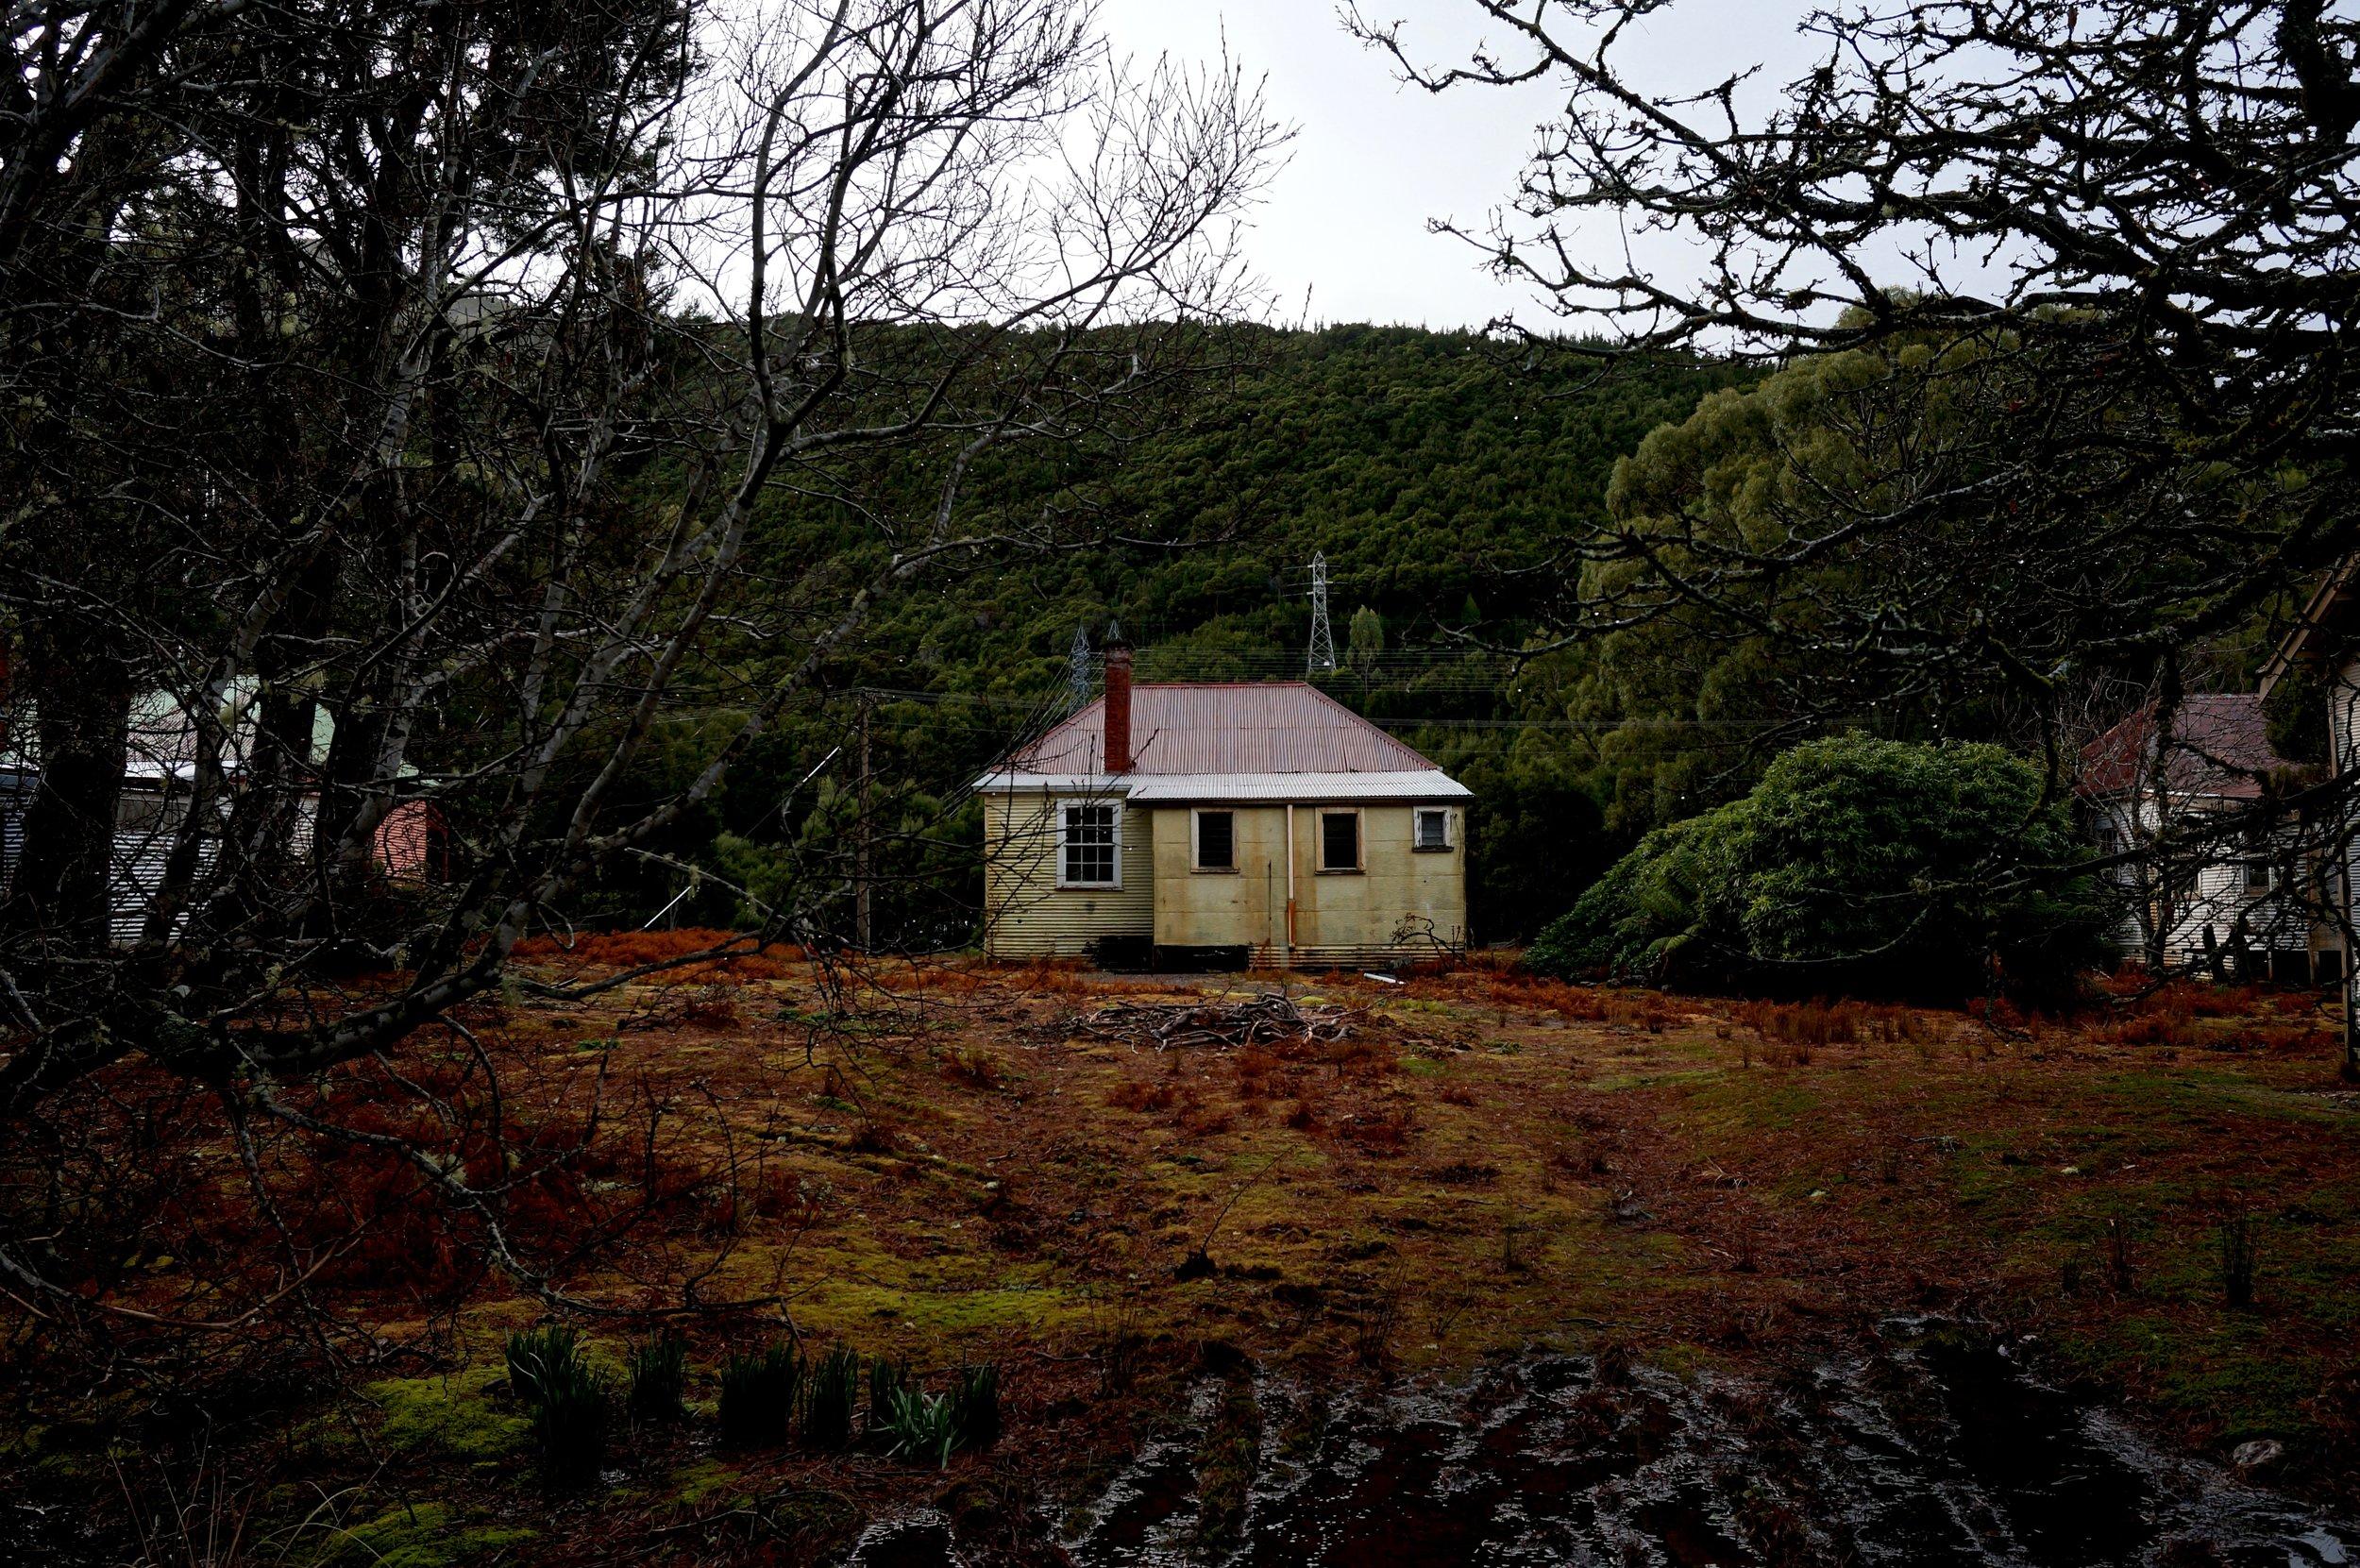 Hydro-power-station-abandoned-house-Heidi-Sze-Apples-Under-My-Bed.jpg